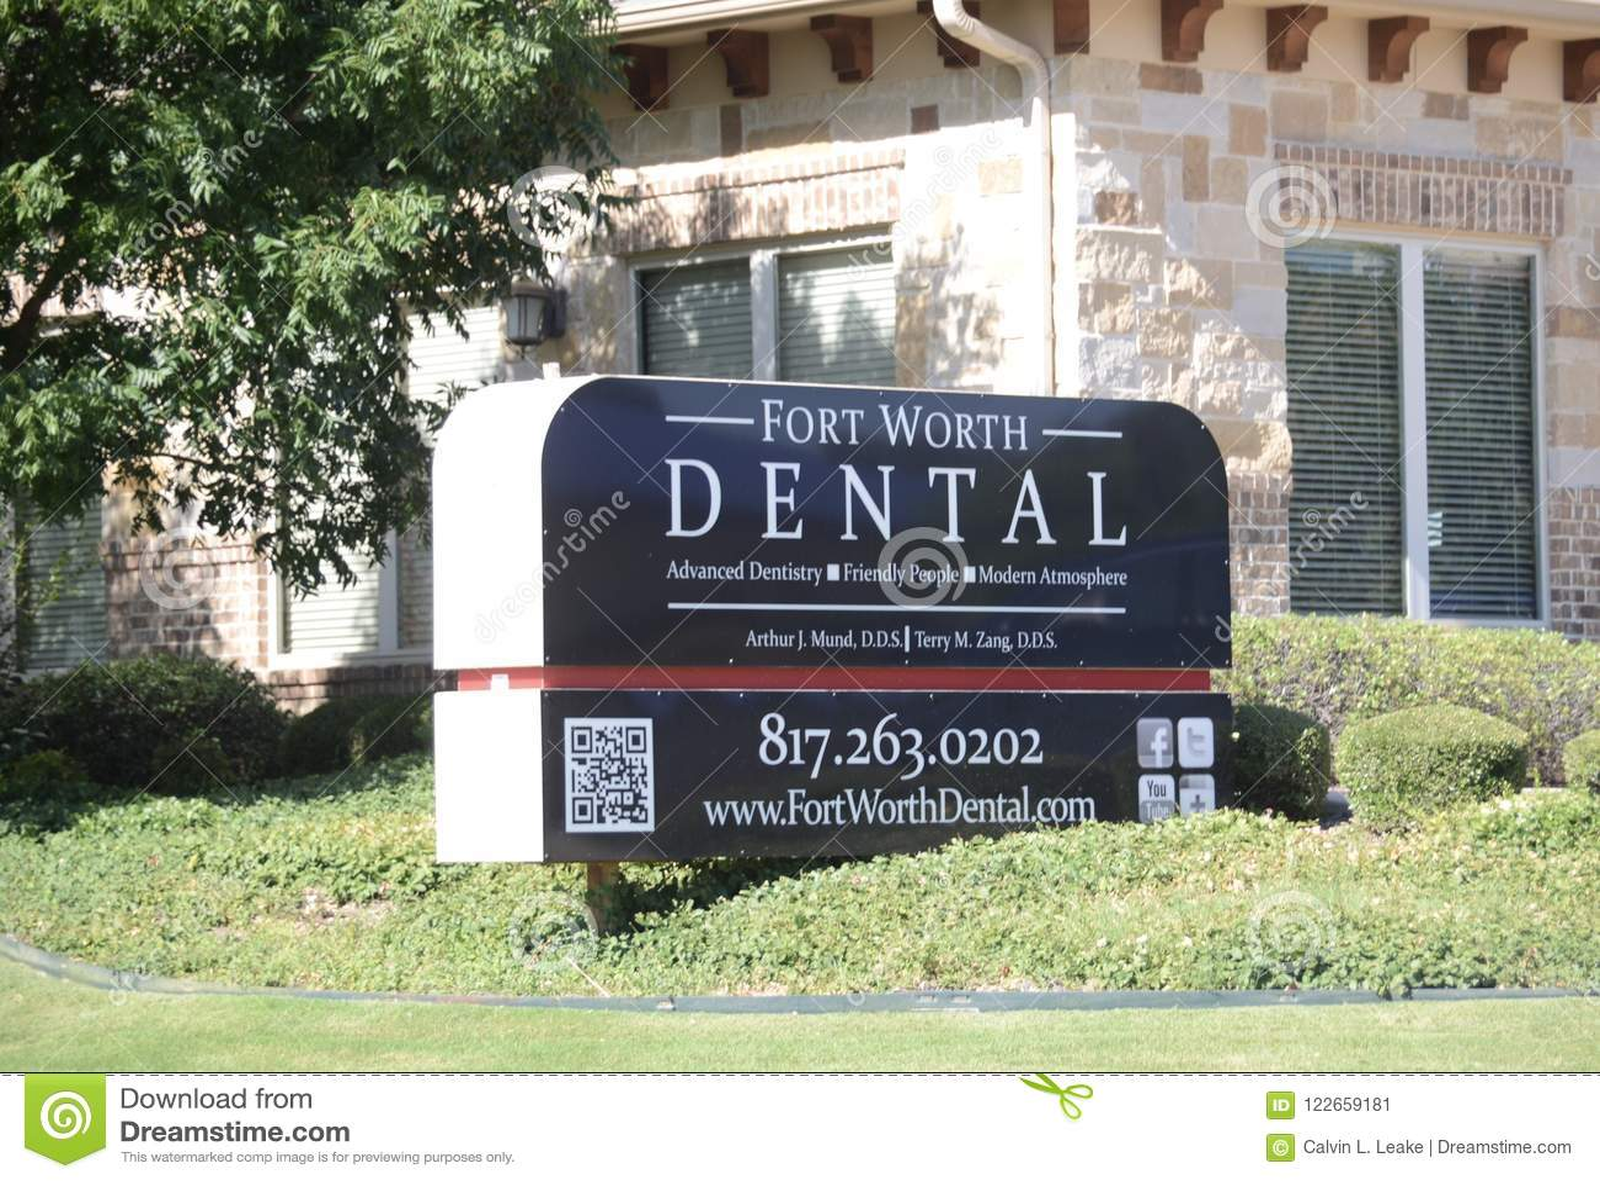 Fort Worth dental, Fort Worth, Texas